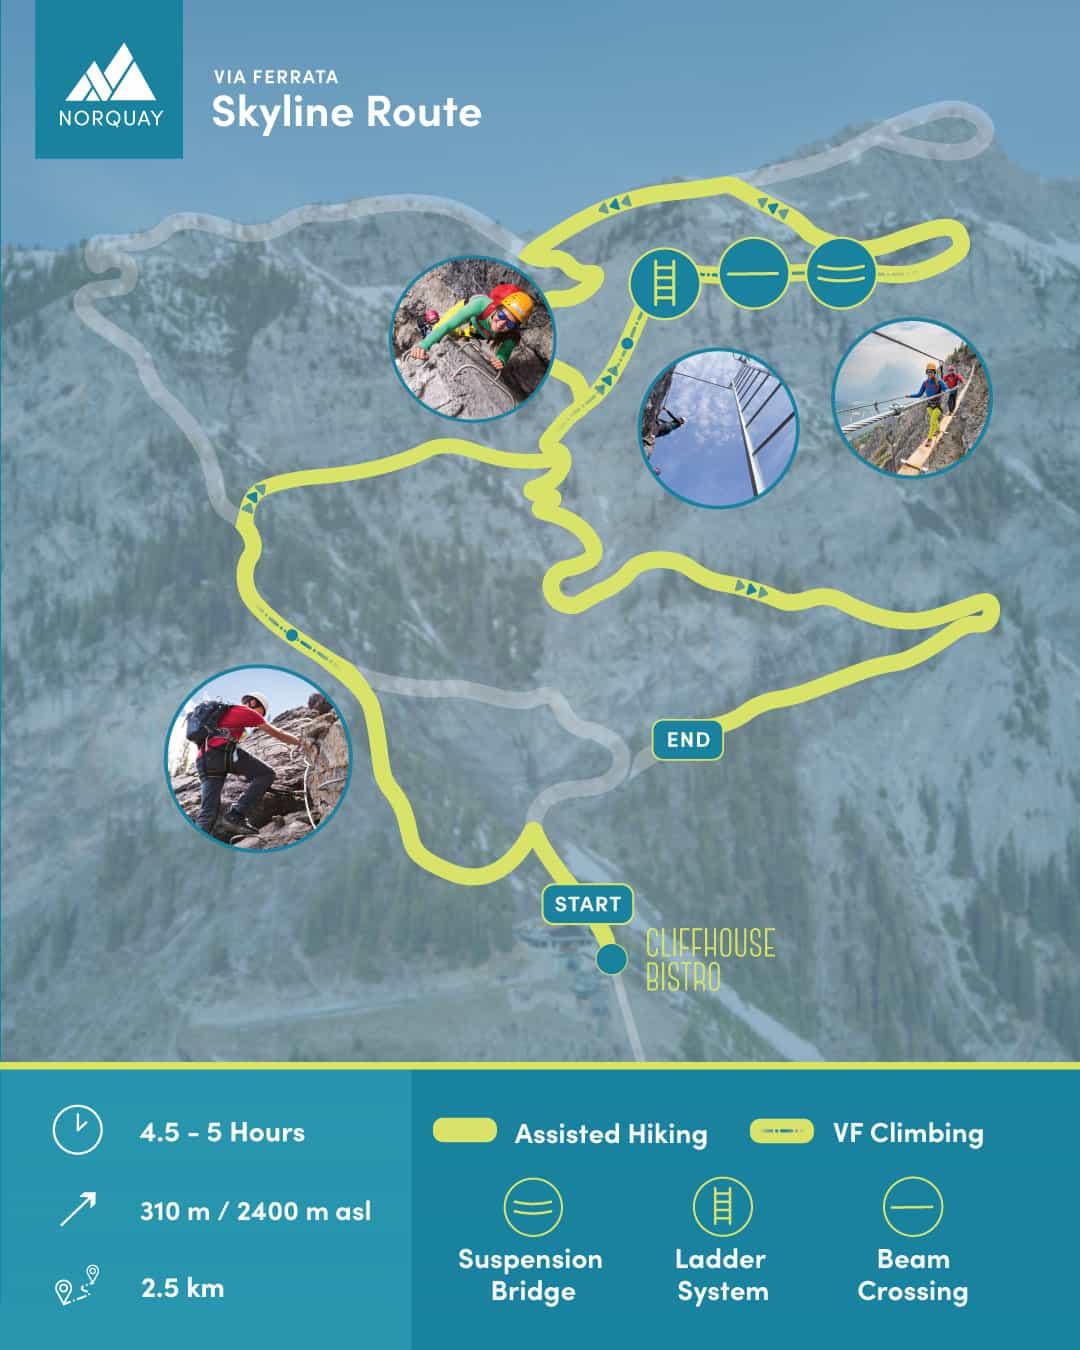 Via Ferrata Skyline Route Map at Banff Mt Norquay